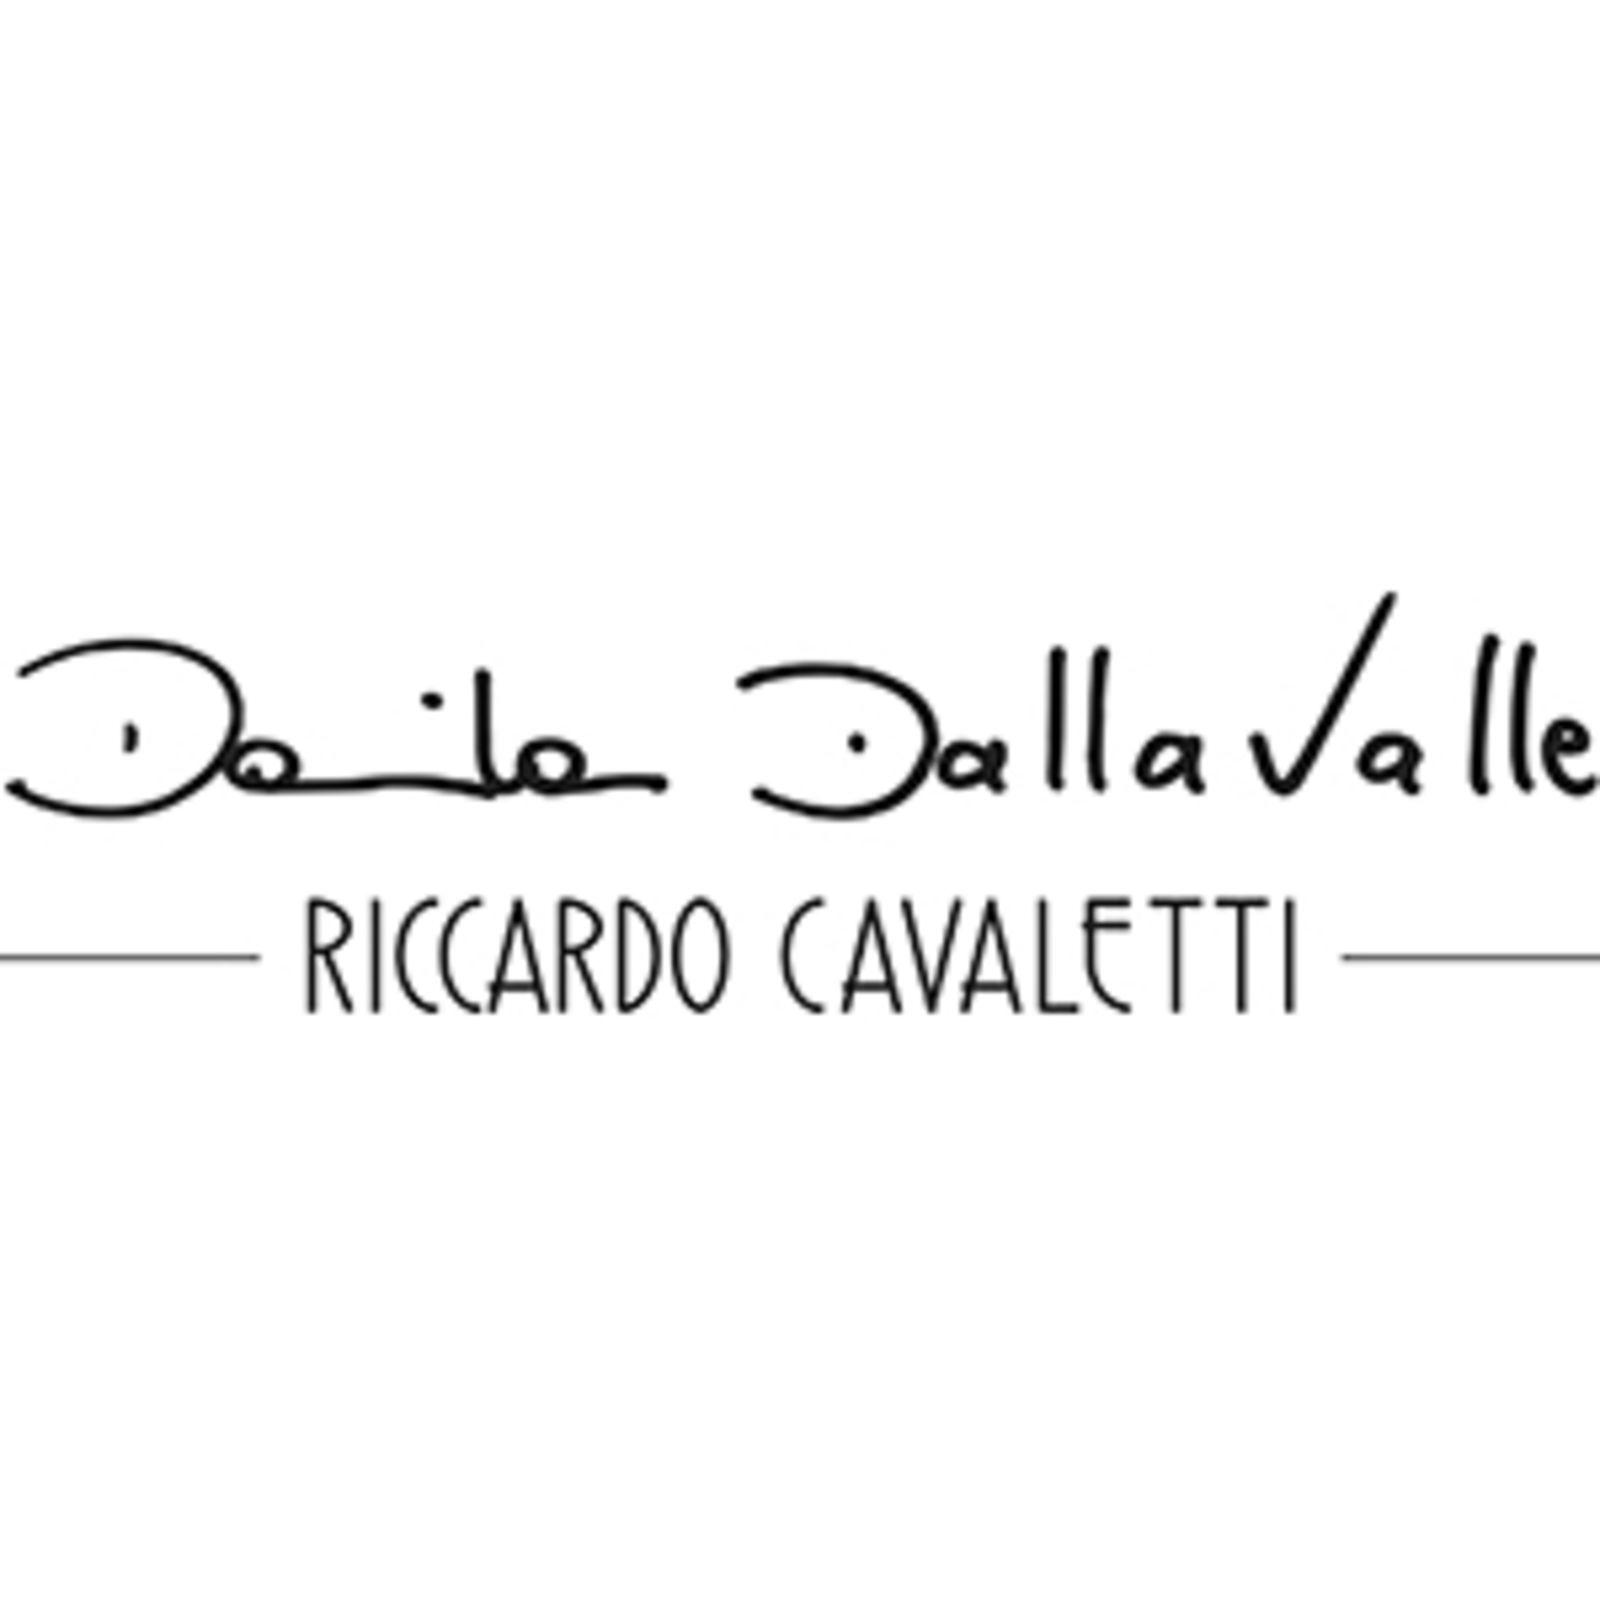 RICCARDO CAVALETTI by DANIELA DALLAVALLE